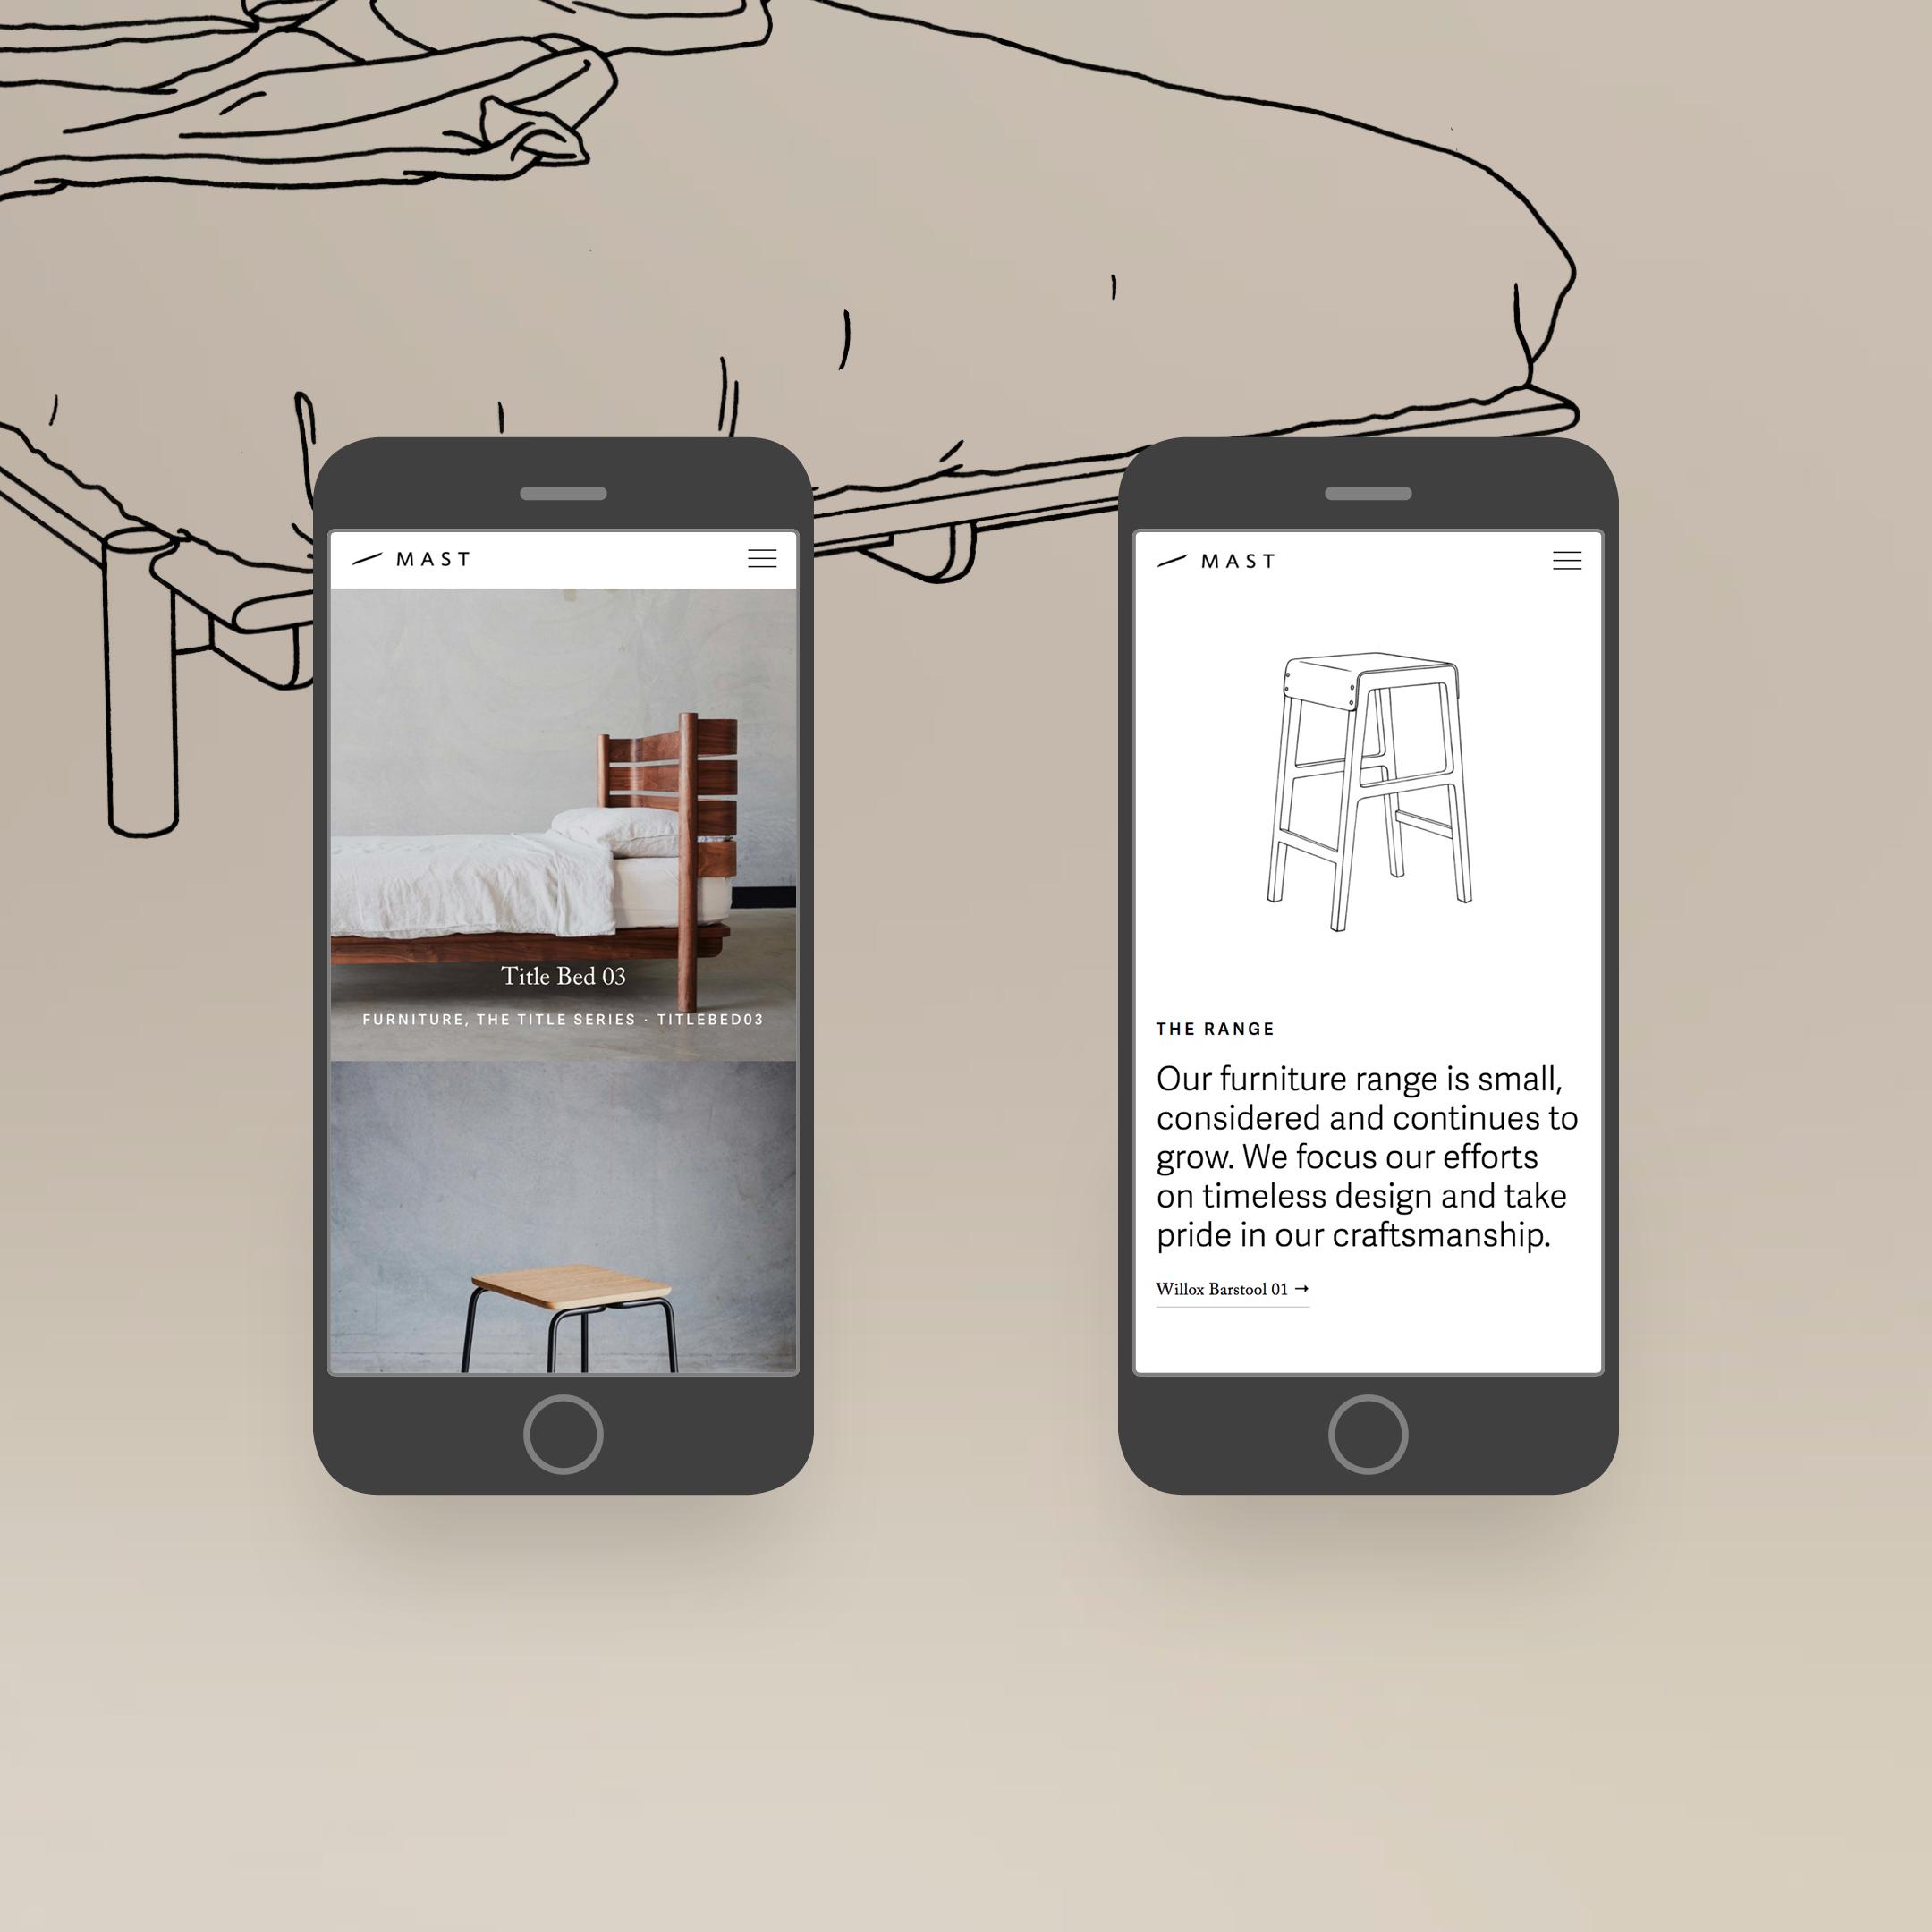 mast-furniture-website3.jpg